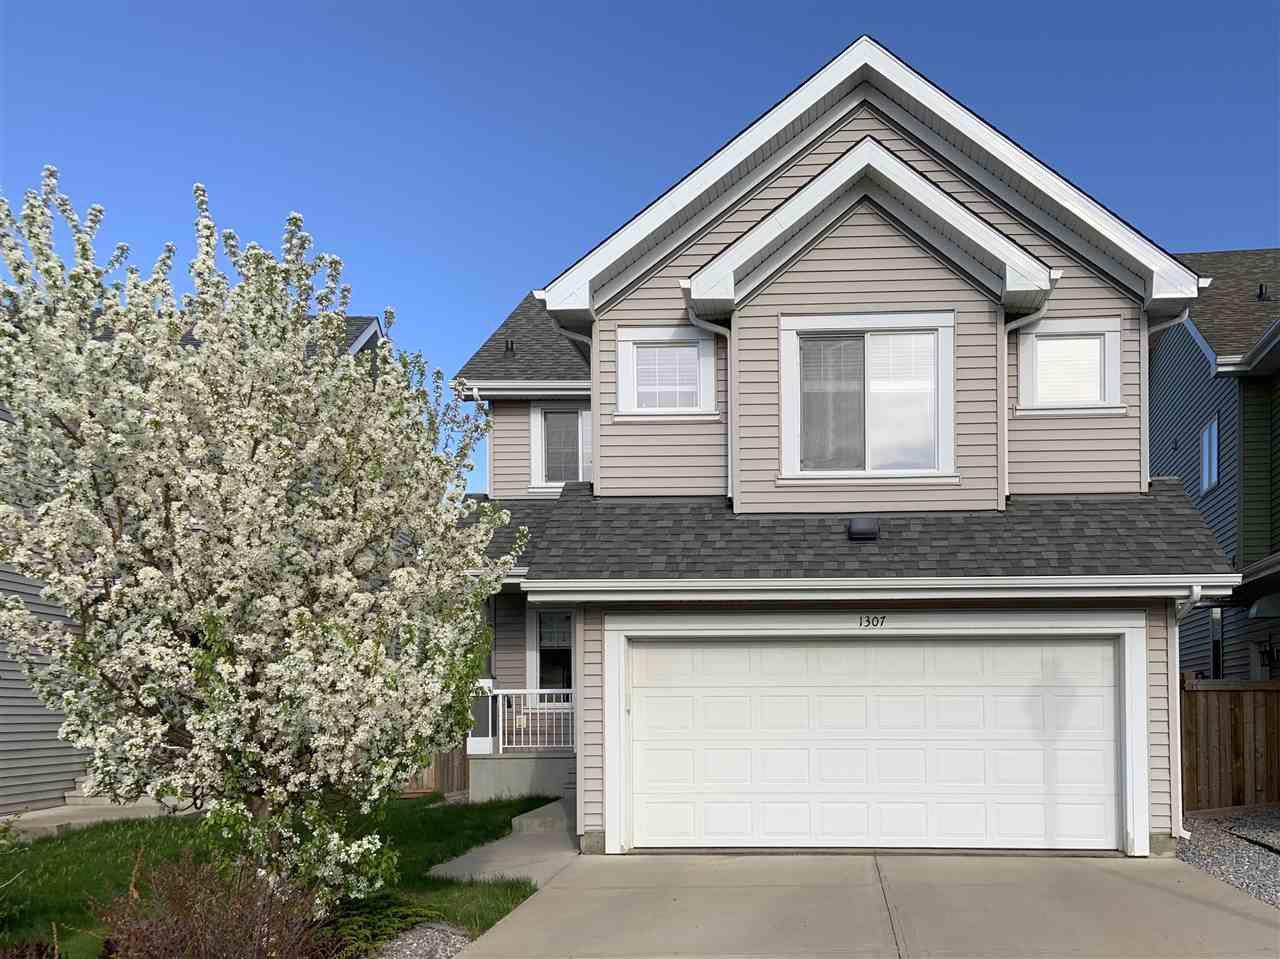 Main Photo: 1307 72 Street in Edmonton: Zone 53 House for sale : MLS®# E4194320